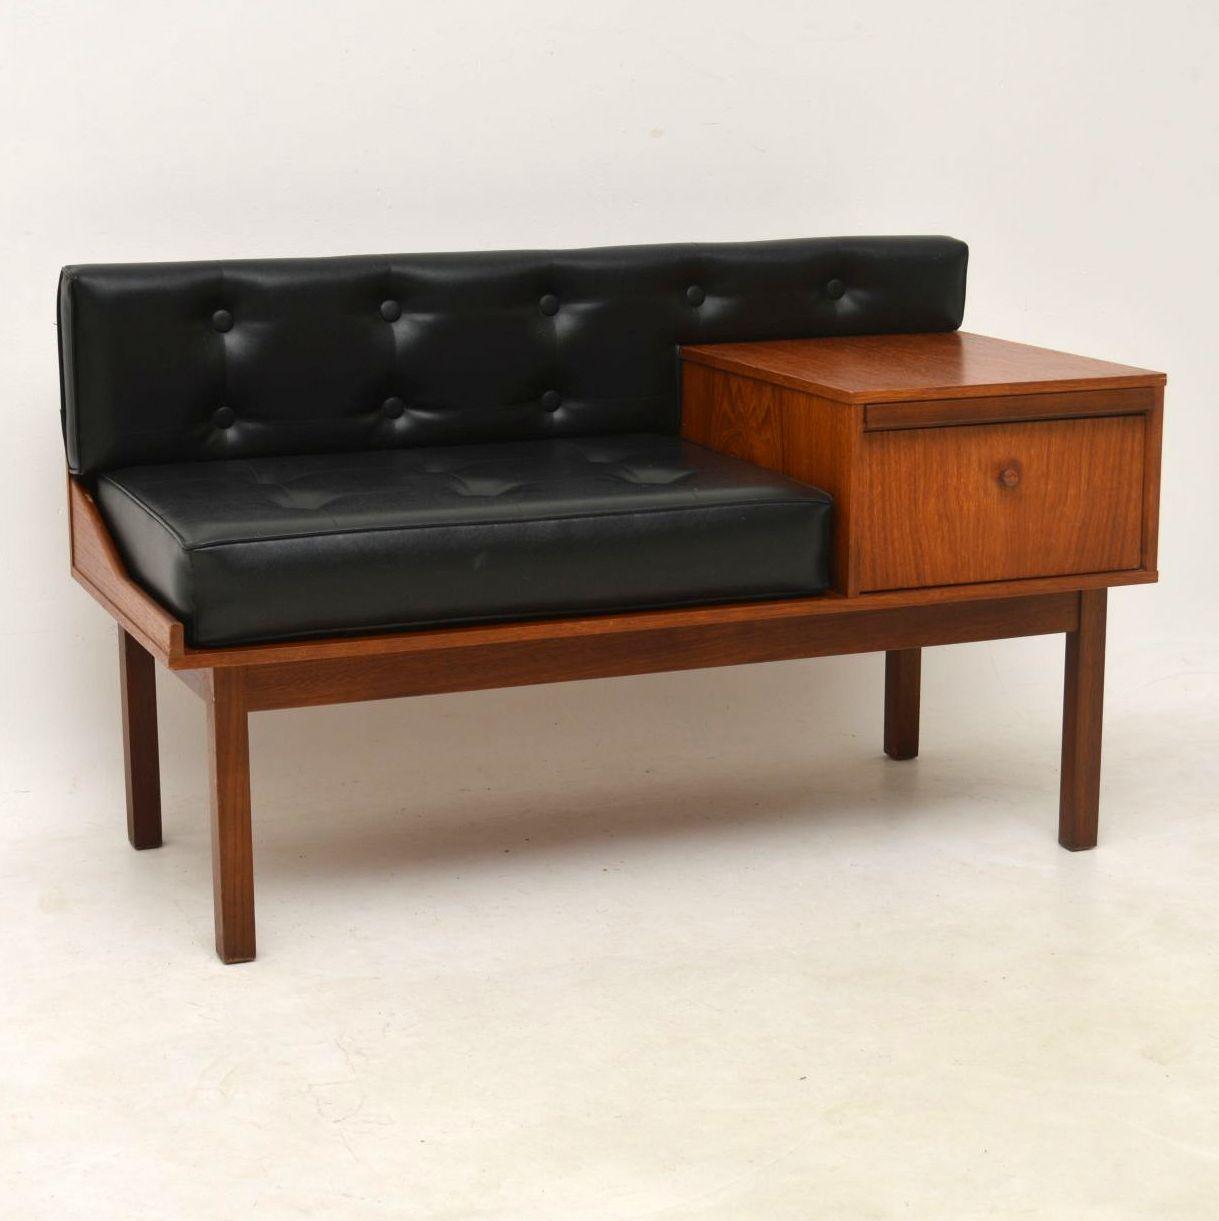 Vintage Dining Danish Chairs Teak